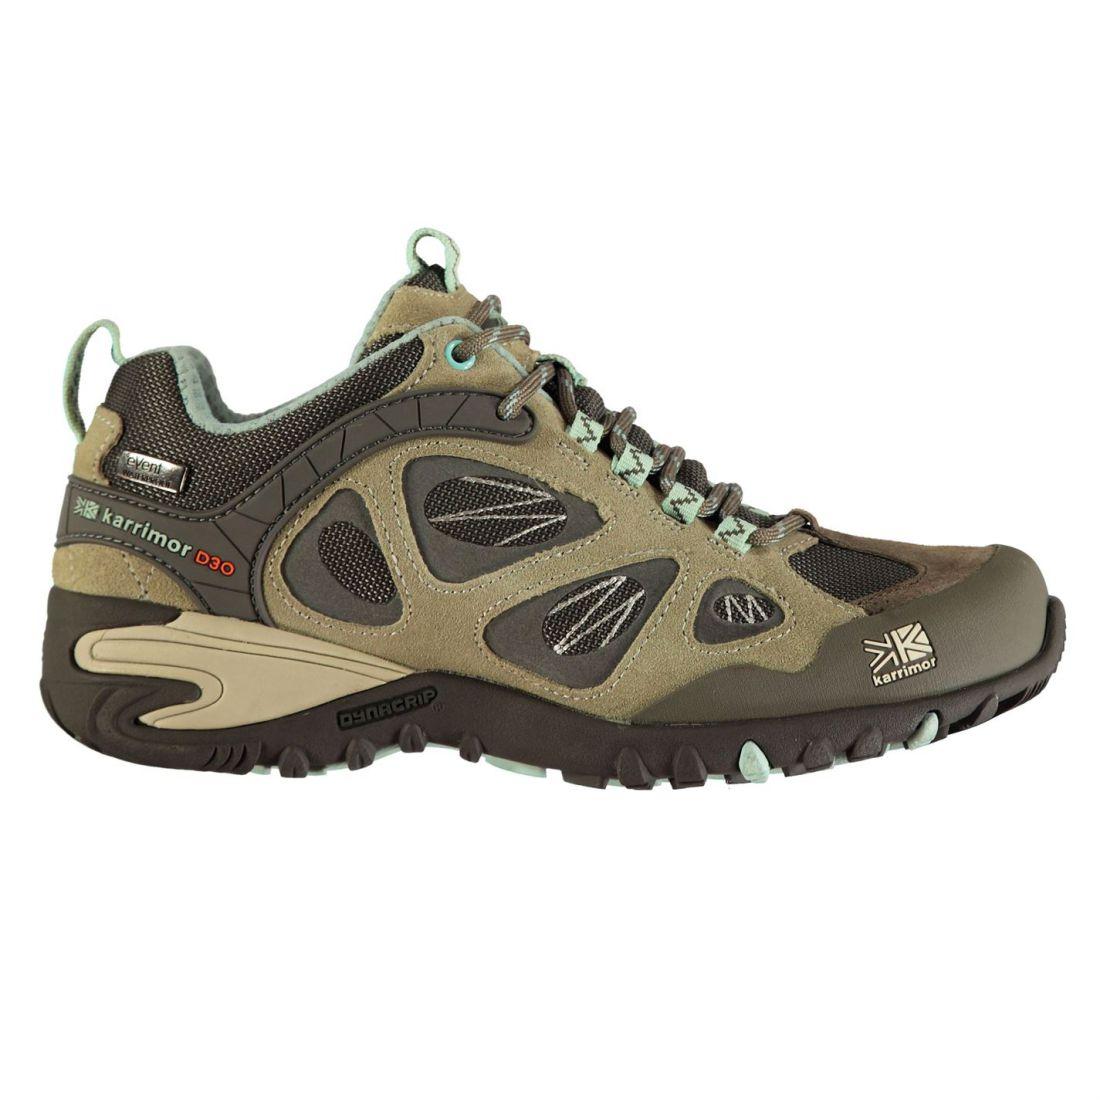 Karrimor Ridge eVent Hiking Outdoor Walking shoes Lace Up Ladies